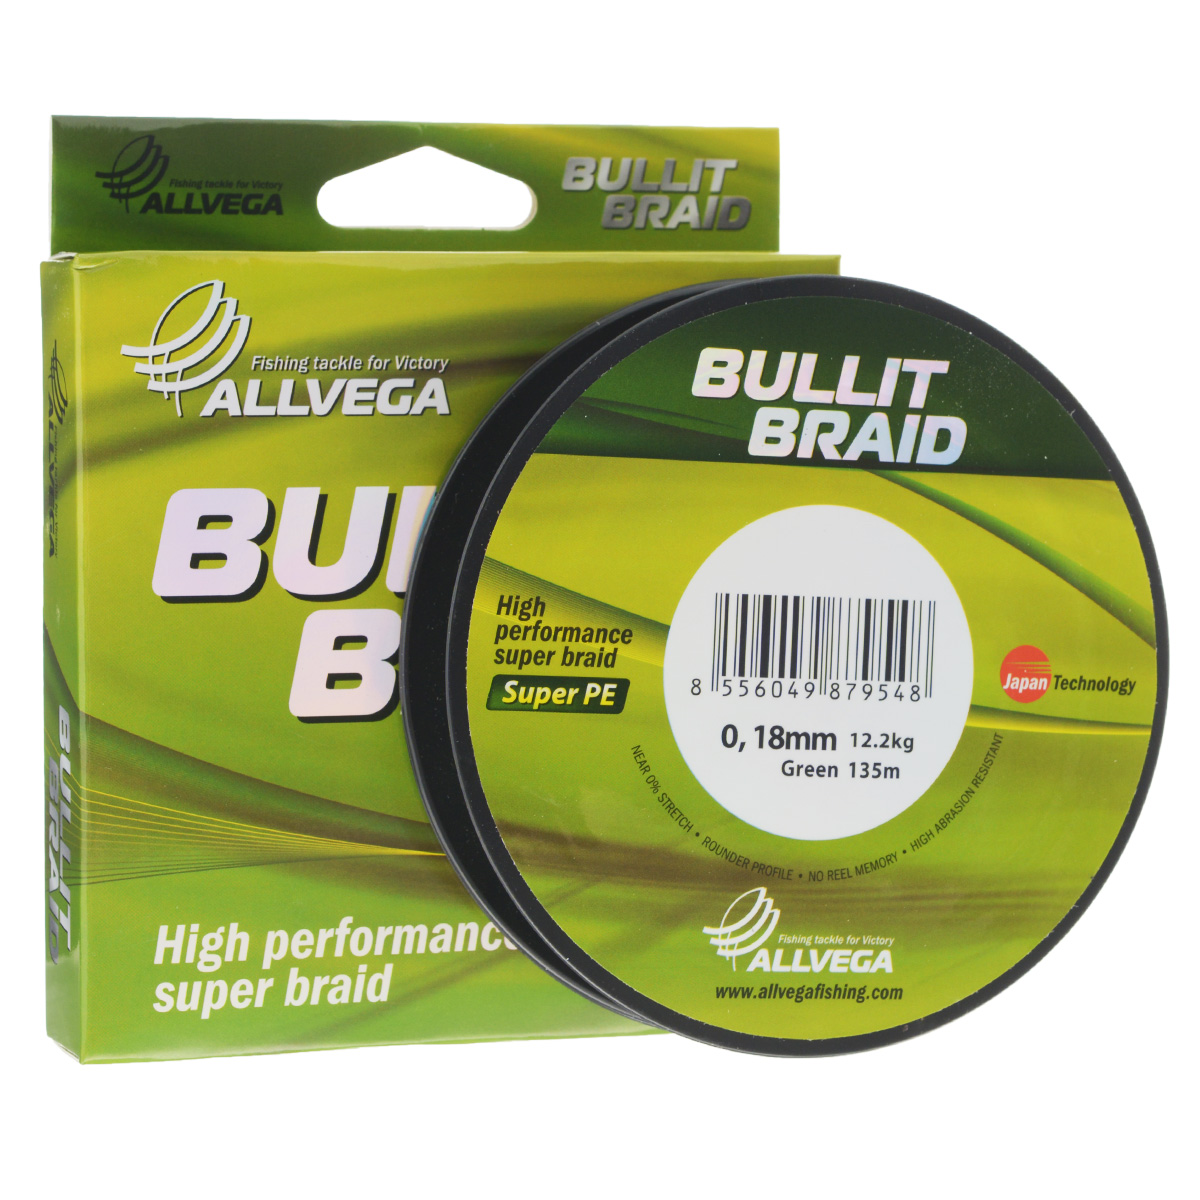 Леска плетеная Allvega Bullit Braid, цвет: темно-зеленый, 135 м, 0,18 мм, 12,2 кг